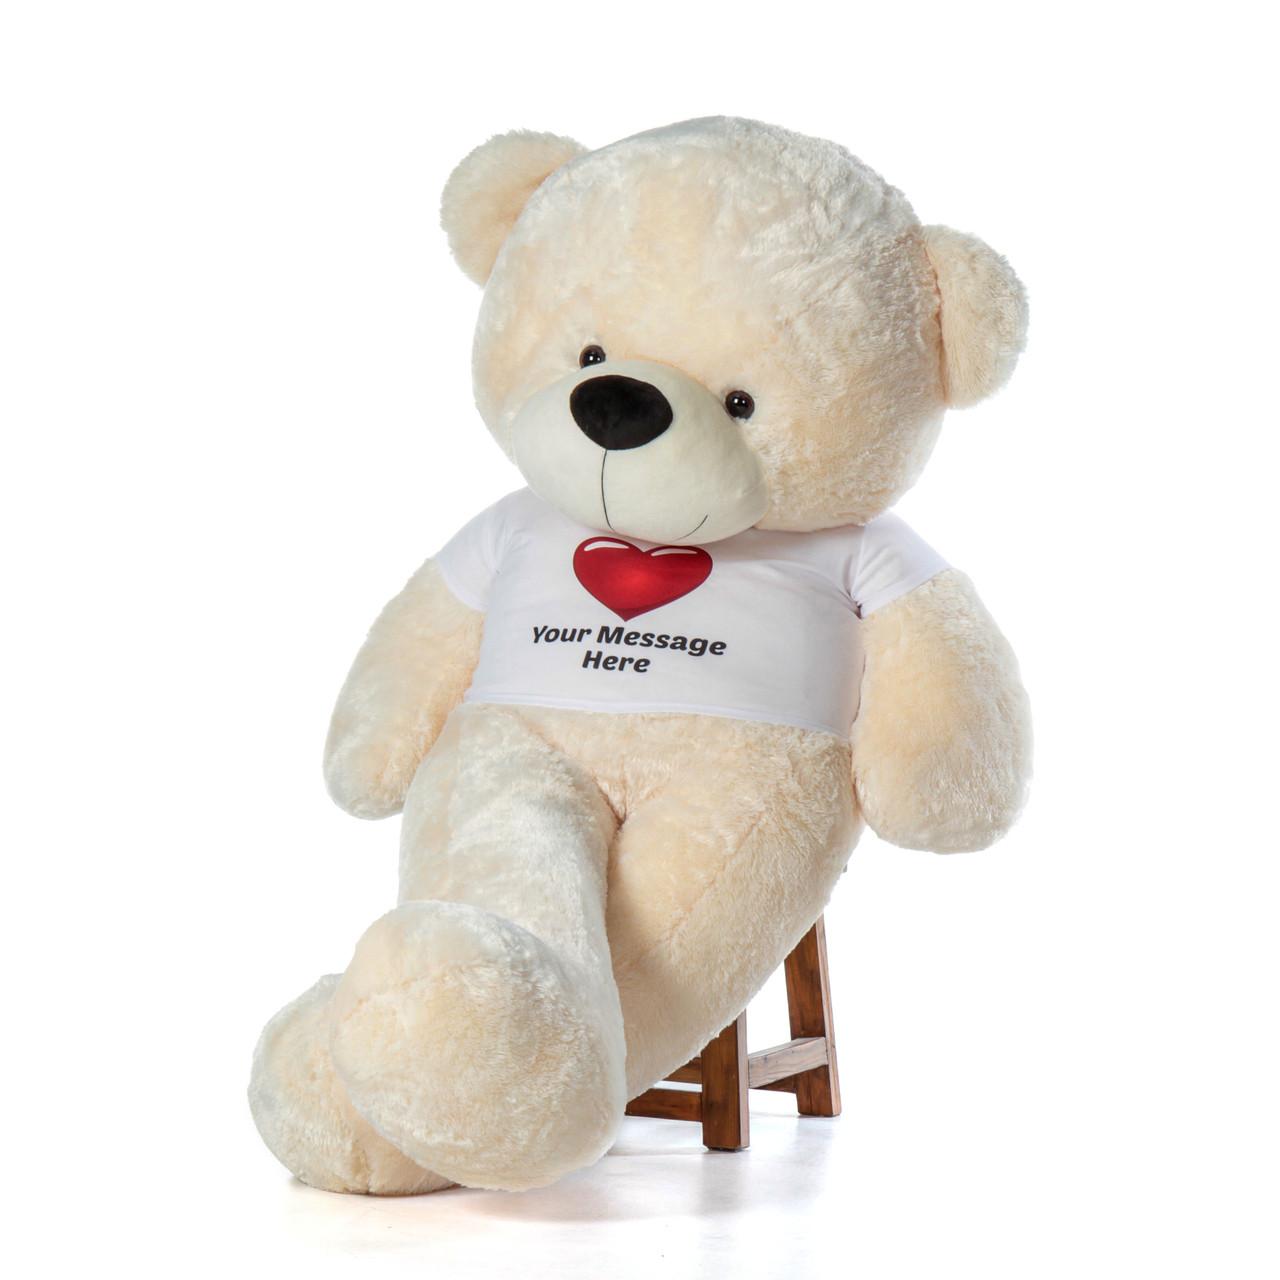 66198c49c02 6ft life size Customized Big Teddy Bear Vanilla Cream Red Heart Shirt